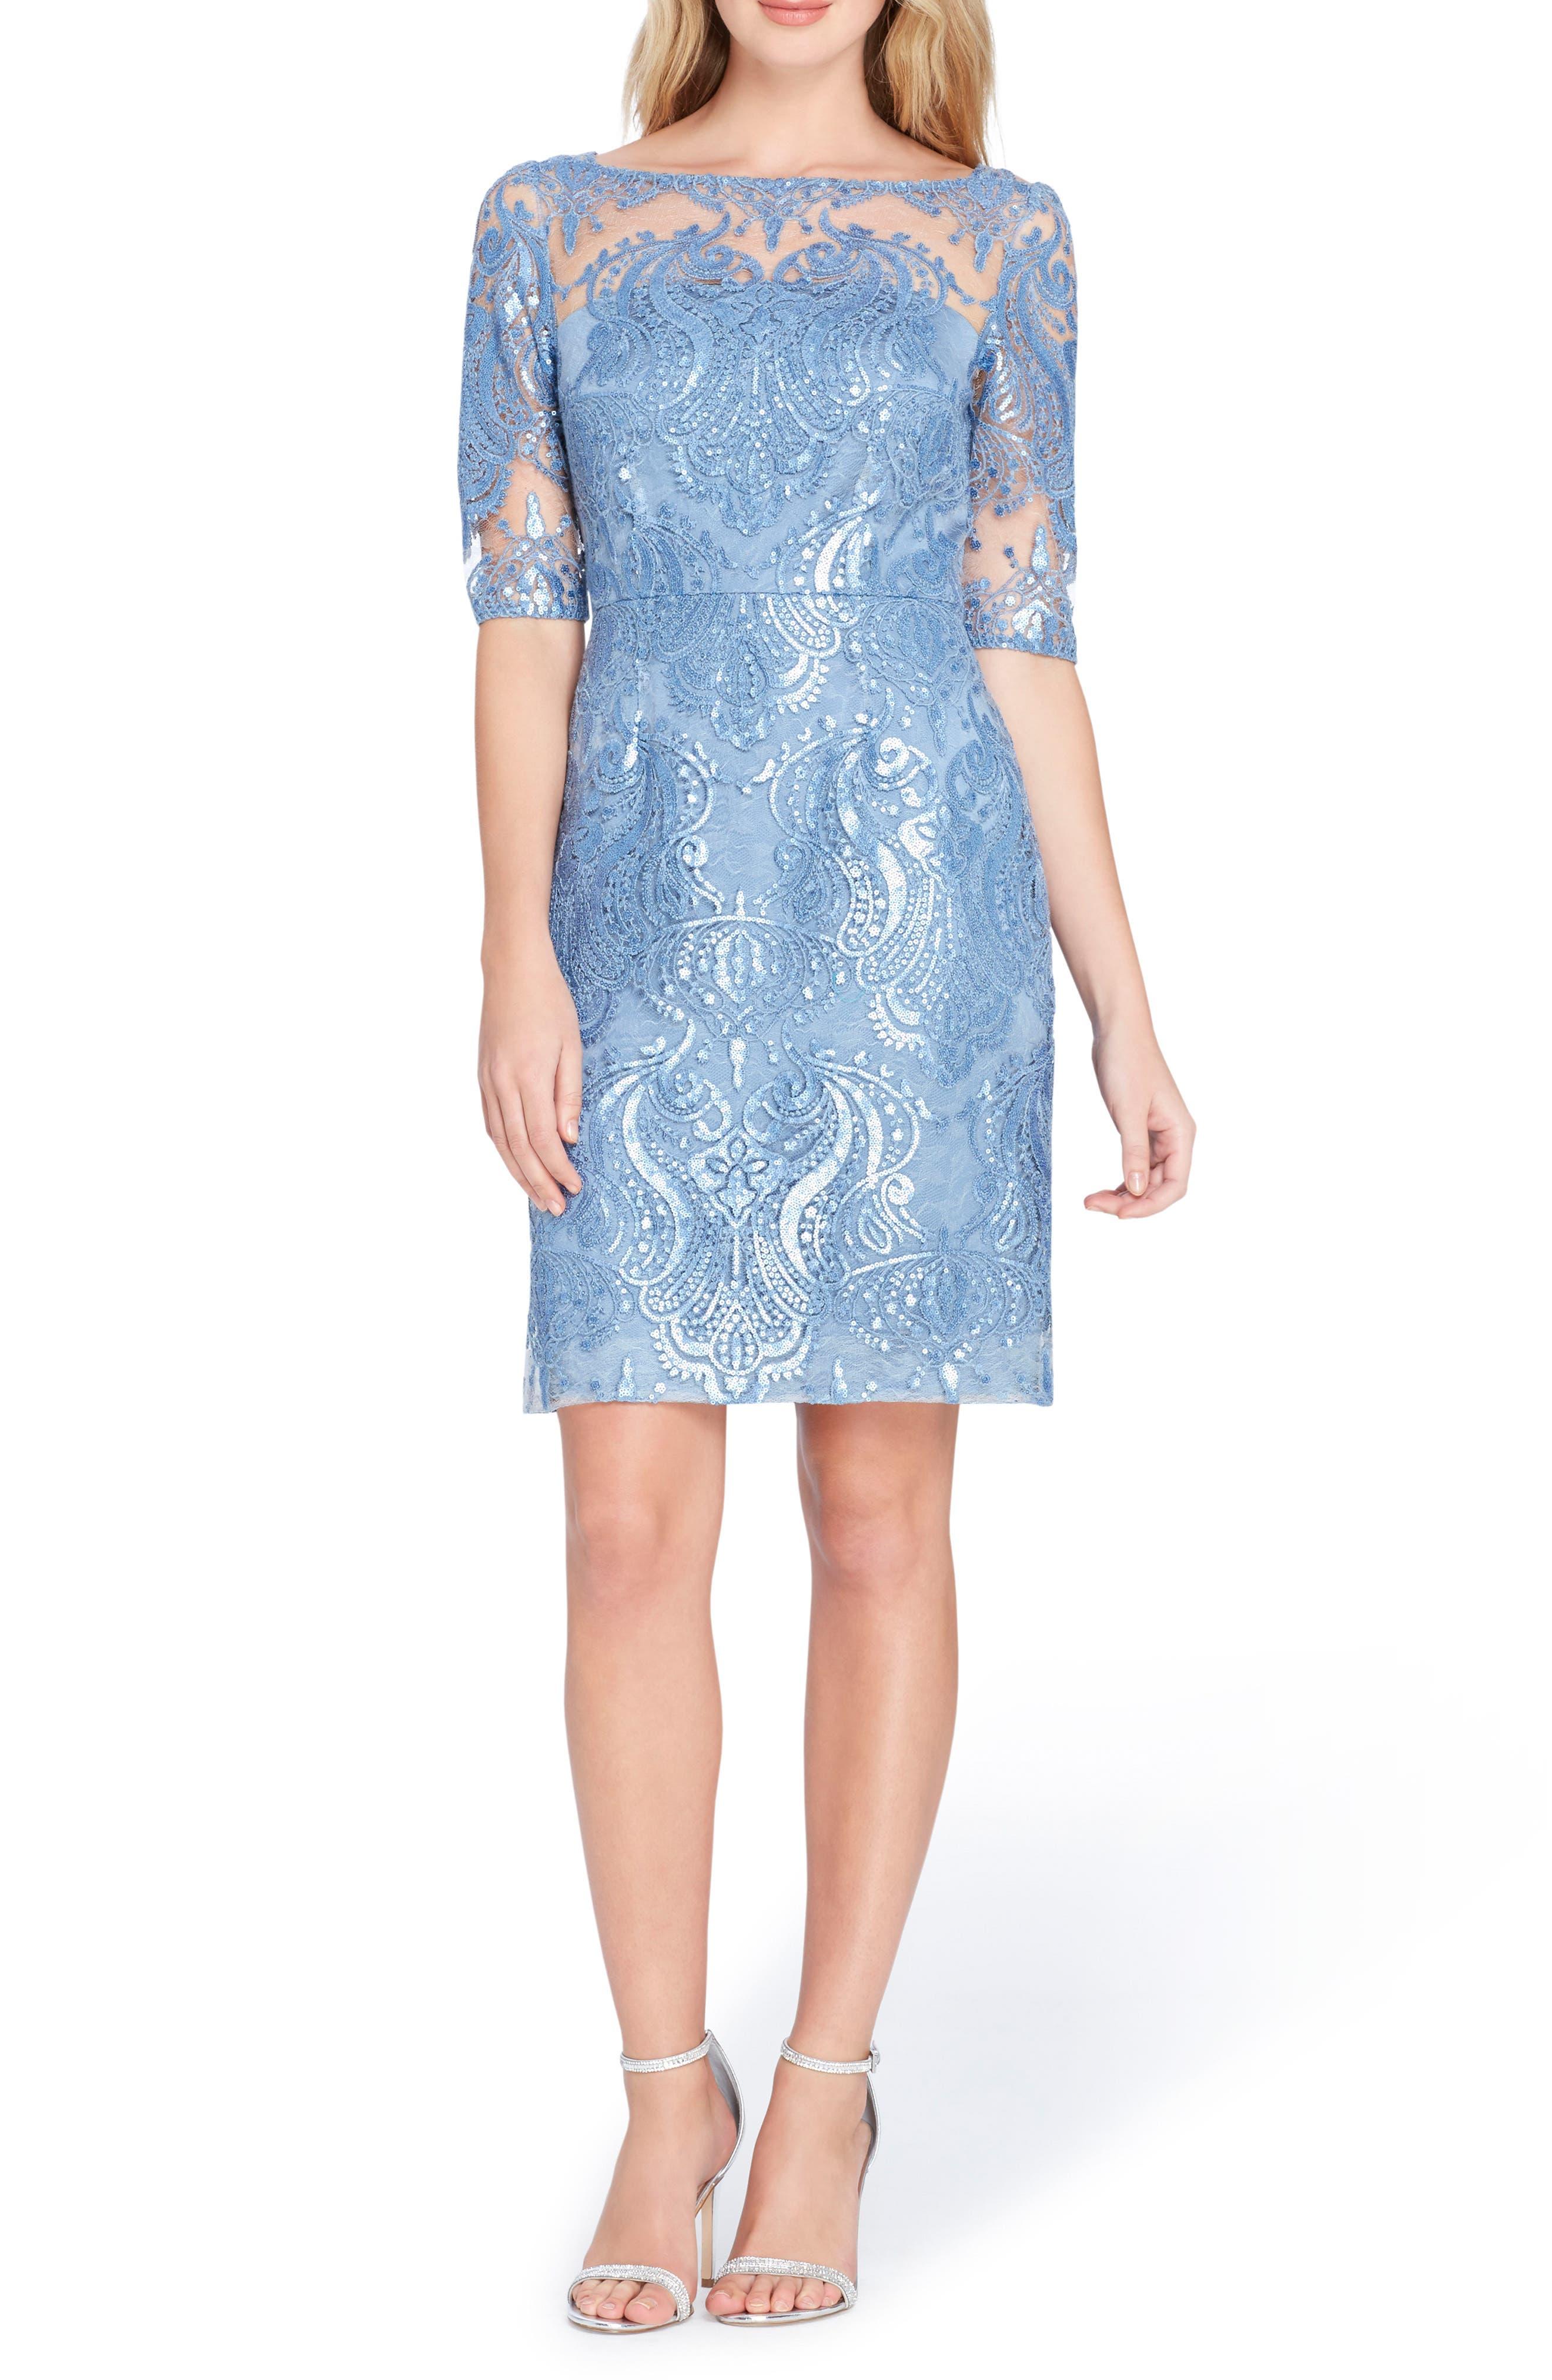 Tahari Cocktail & Party Dresses | Nordstrom